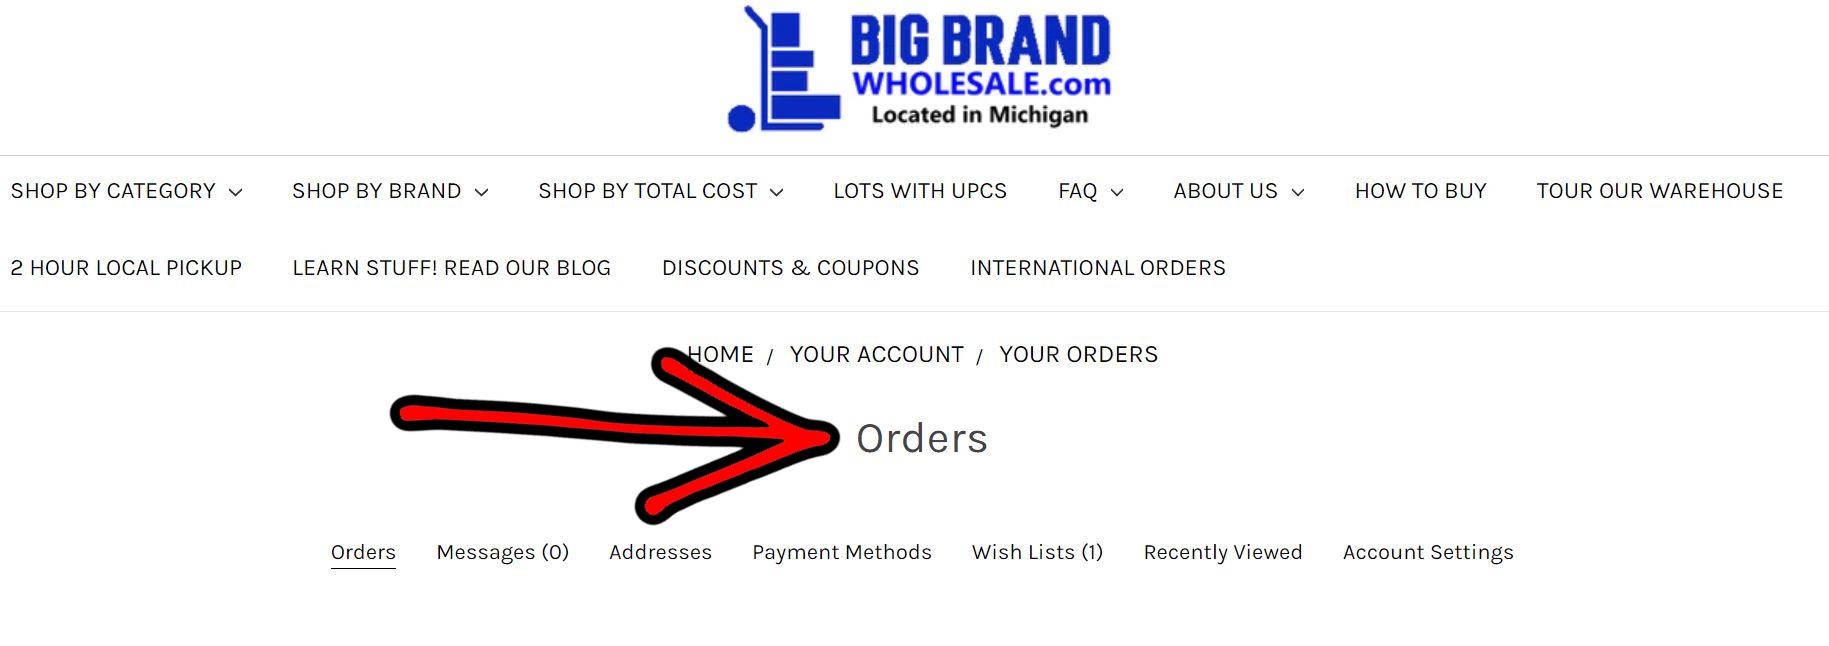 orders-main.jpg